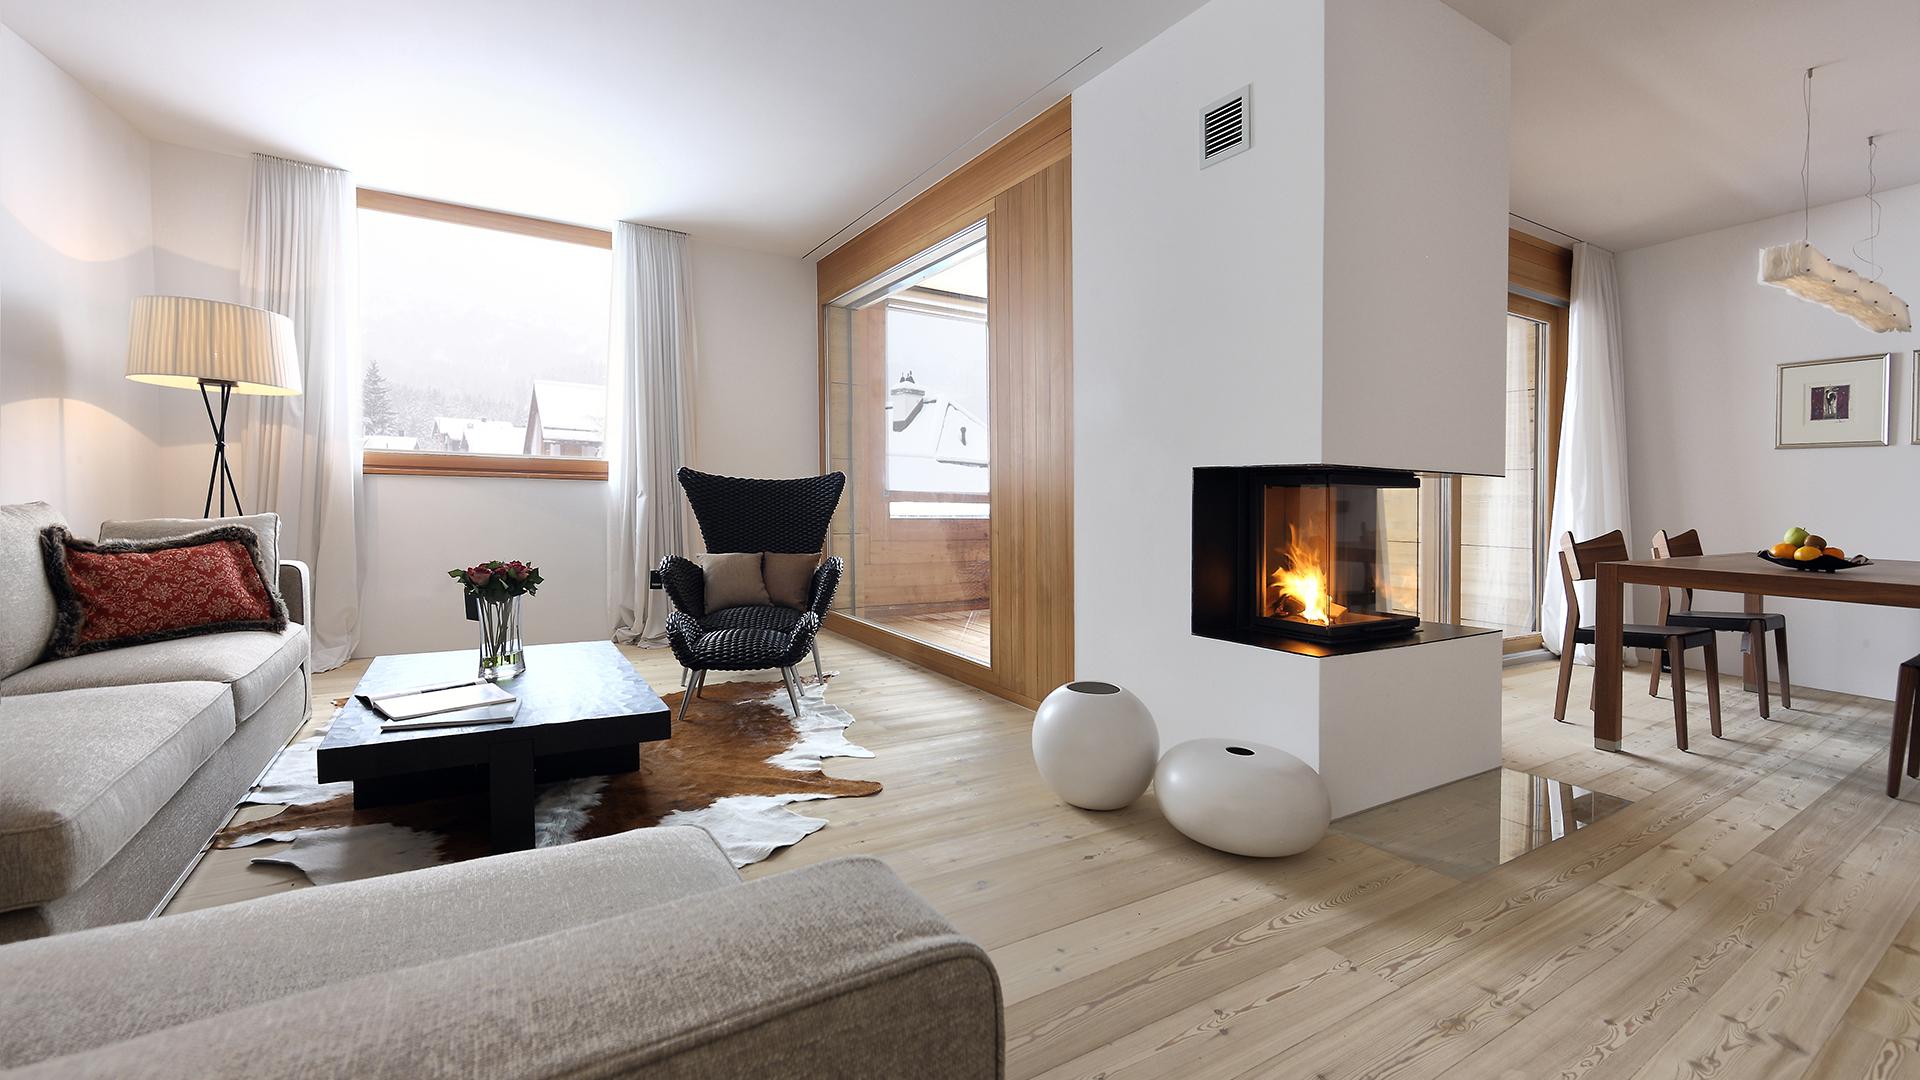 Haus Corona Apartments, Switzerland